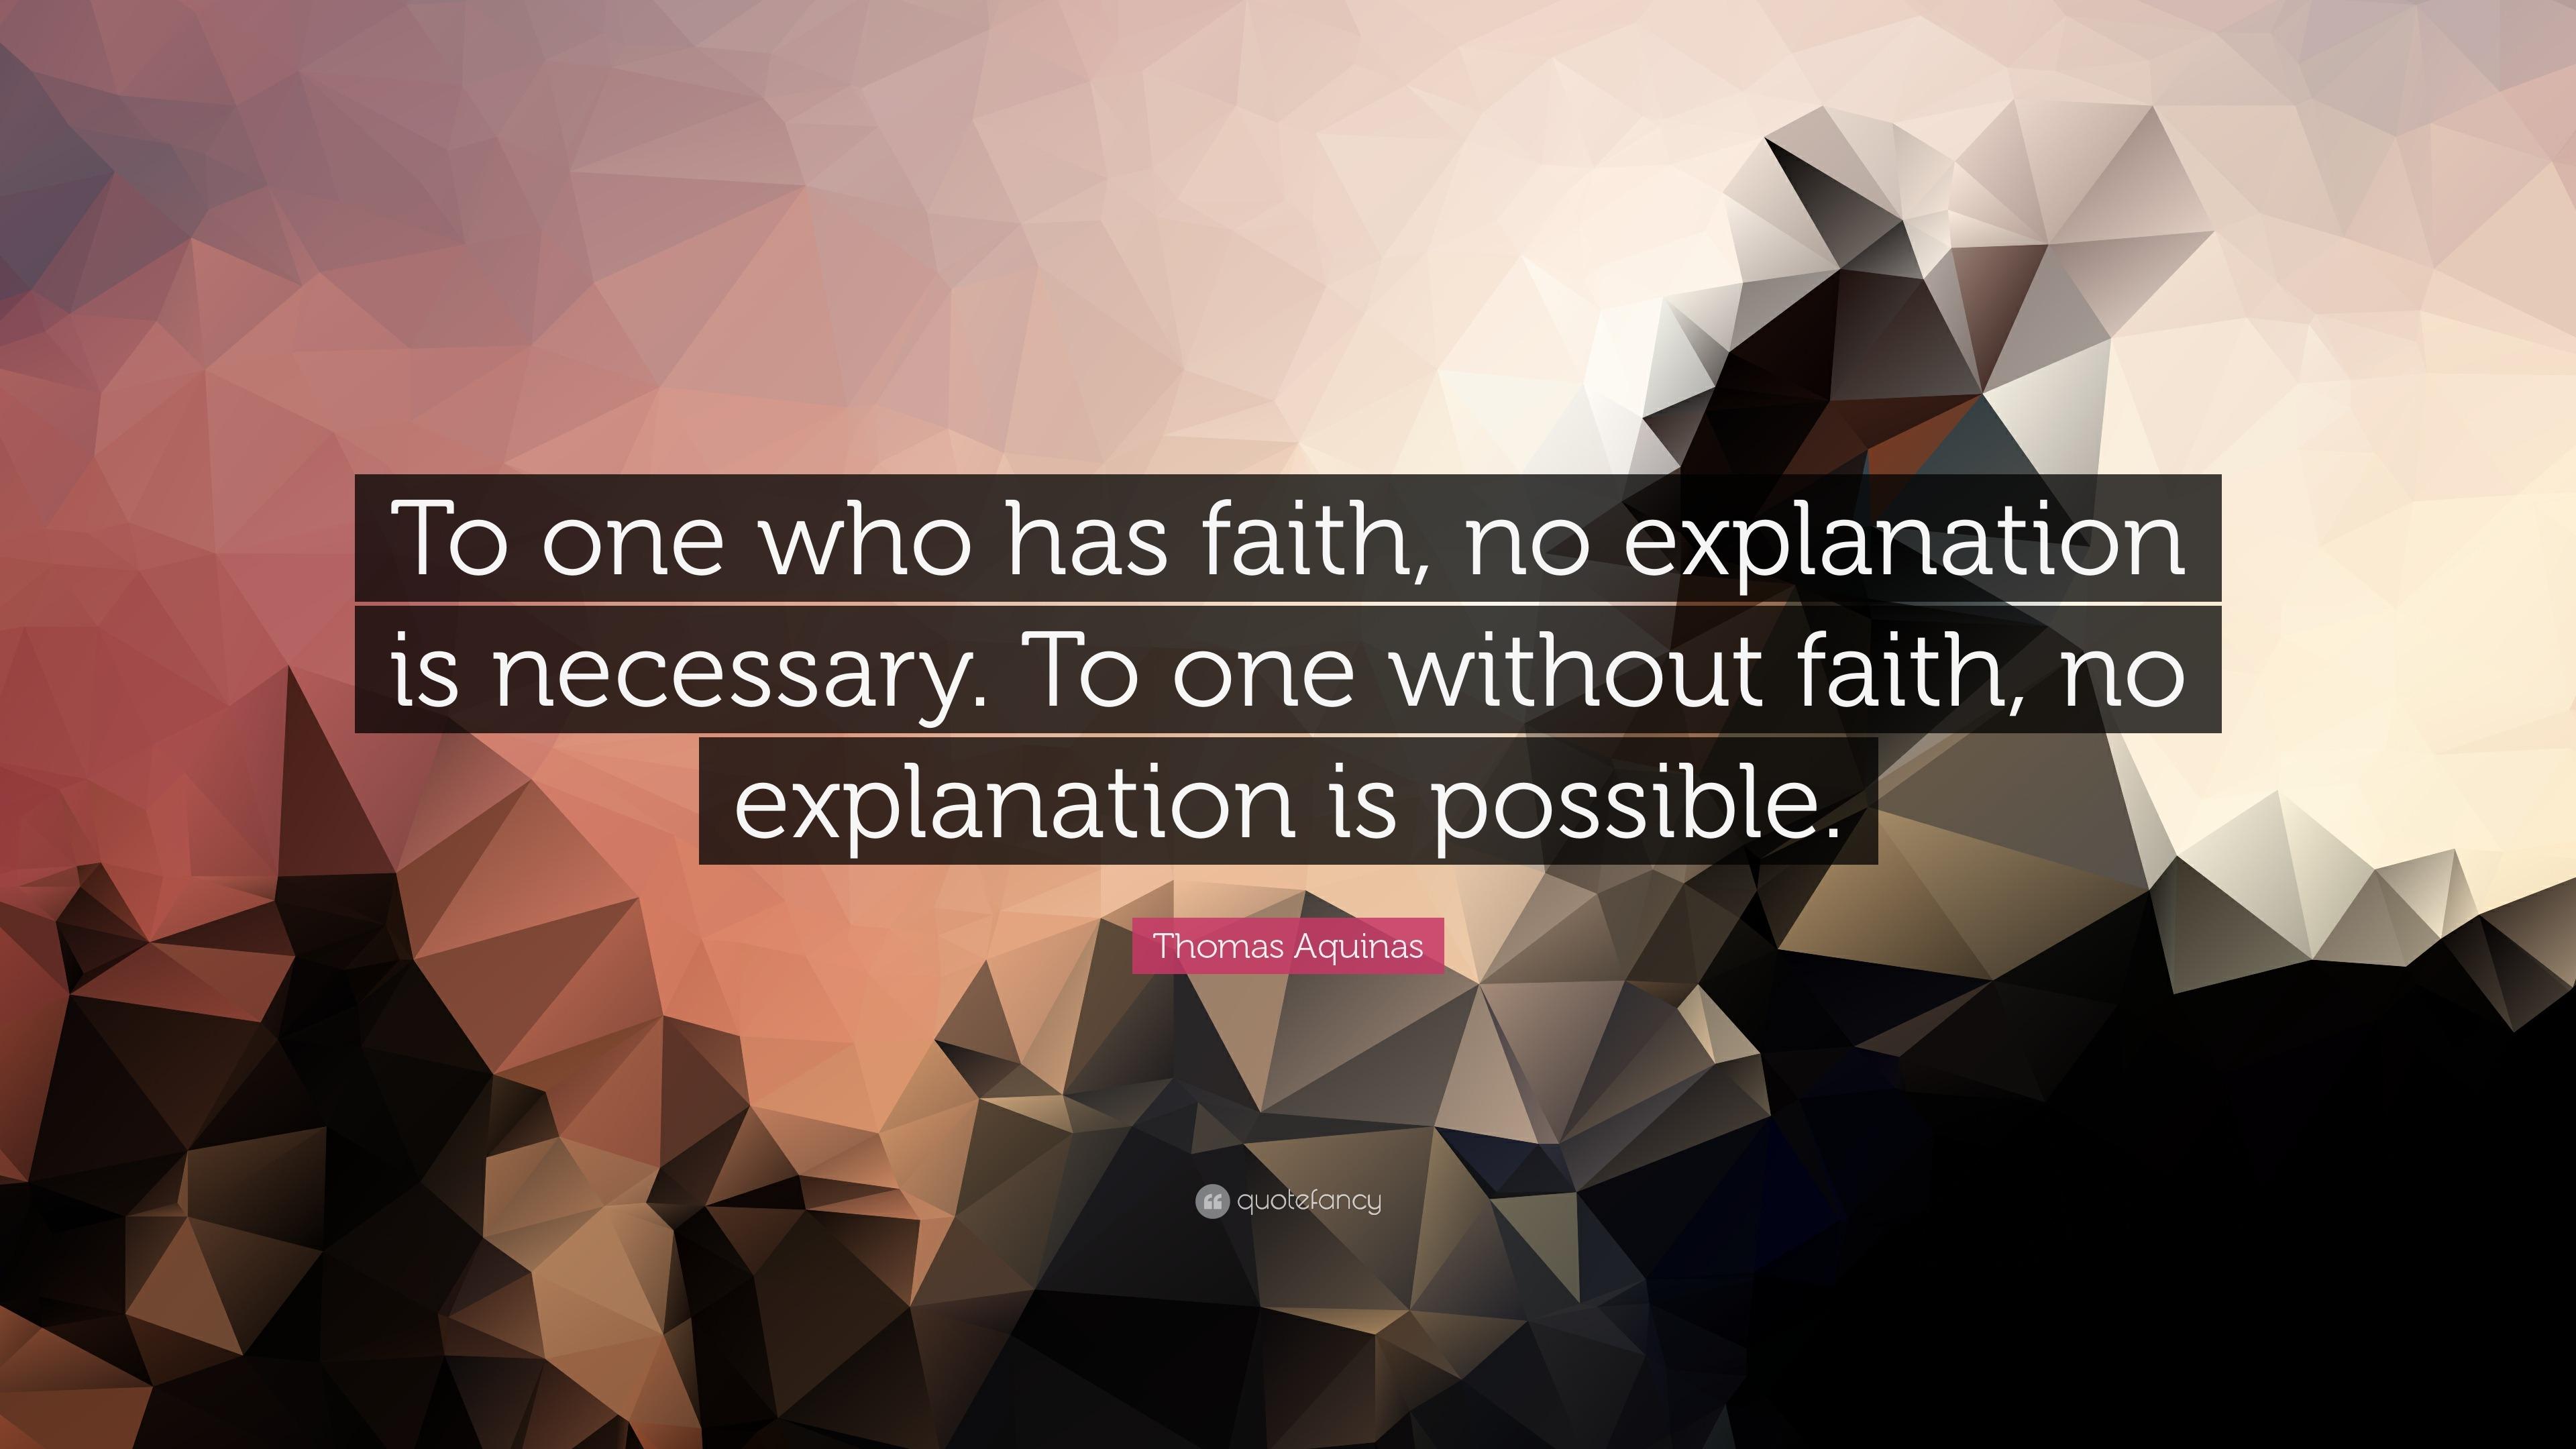 thomas aquinas quote to one who has faith no